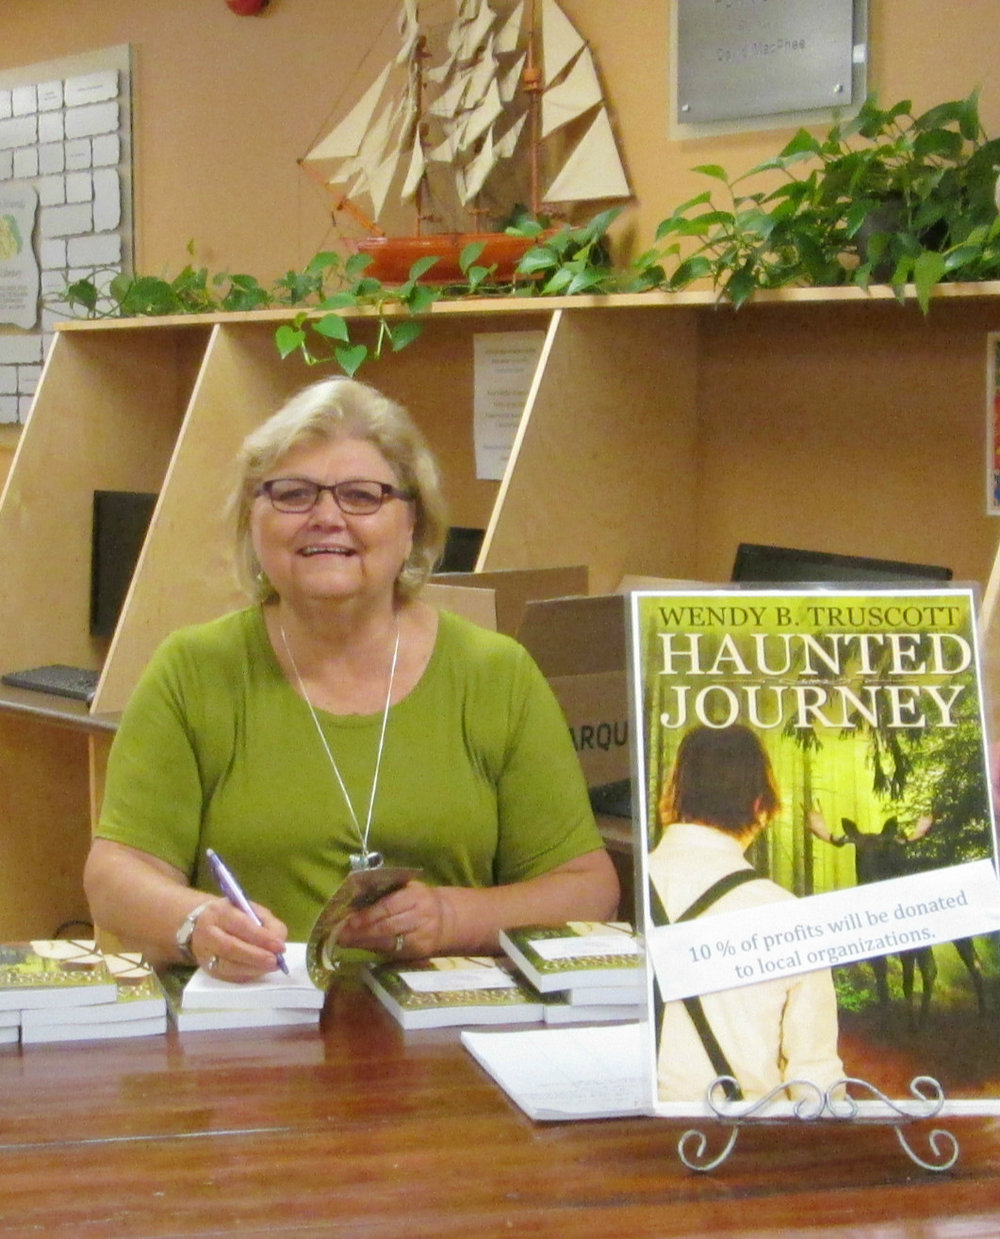 wendy's book launch 001.JPG